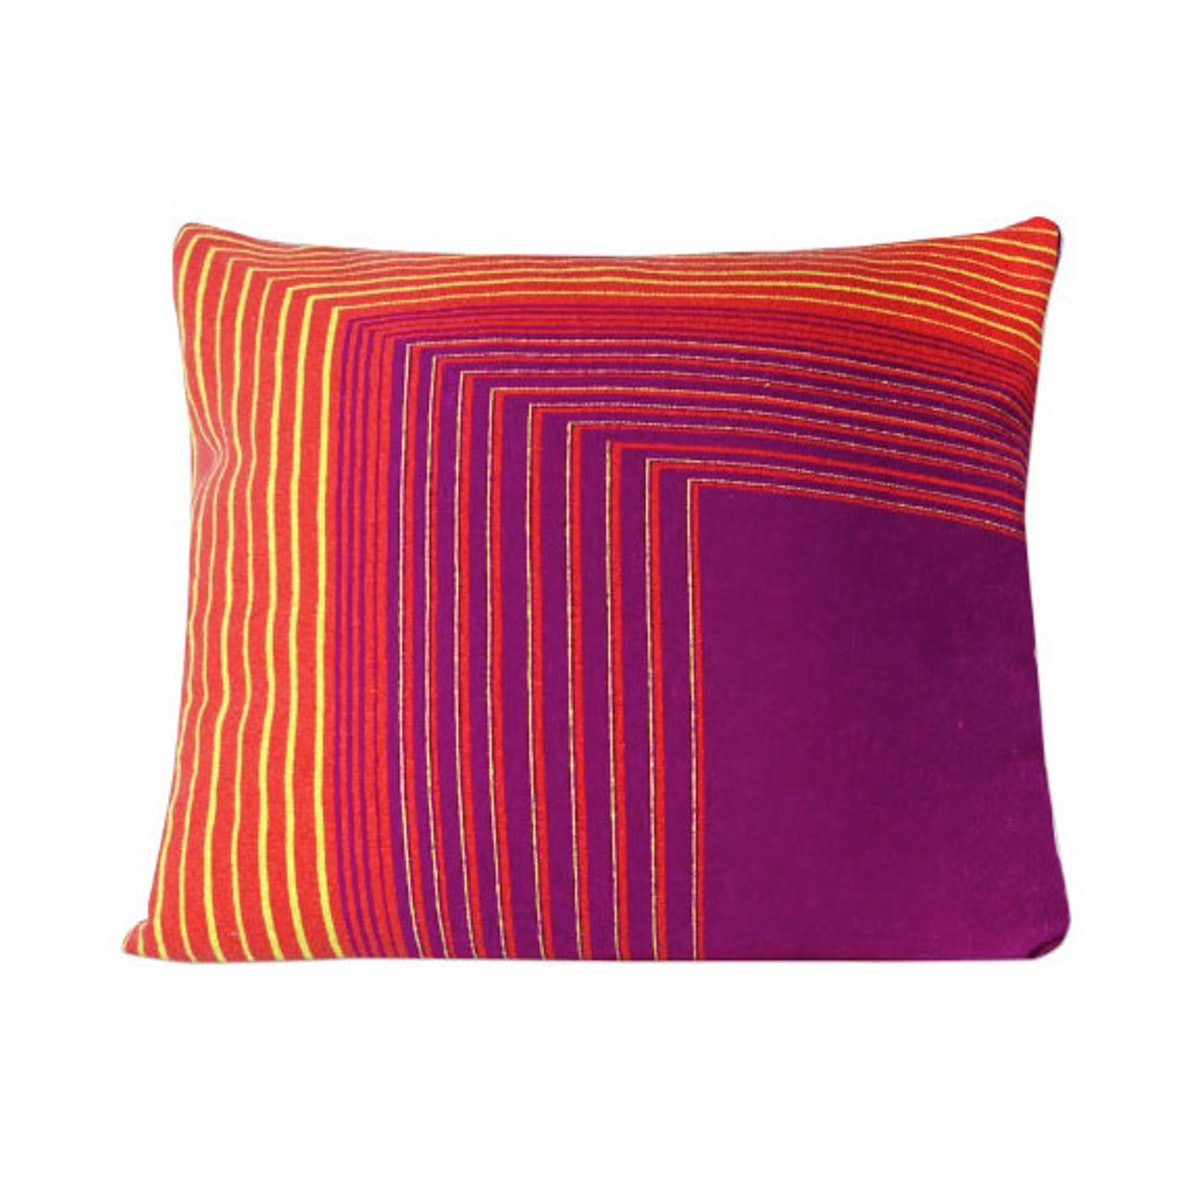 Tabula Rasa pillow